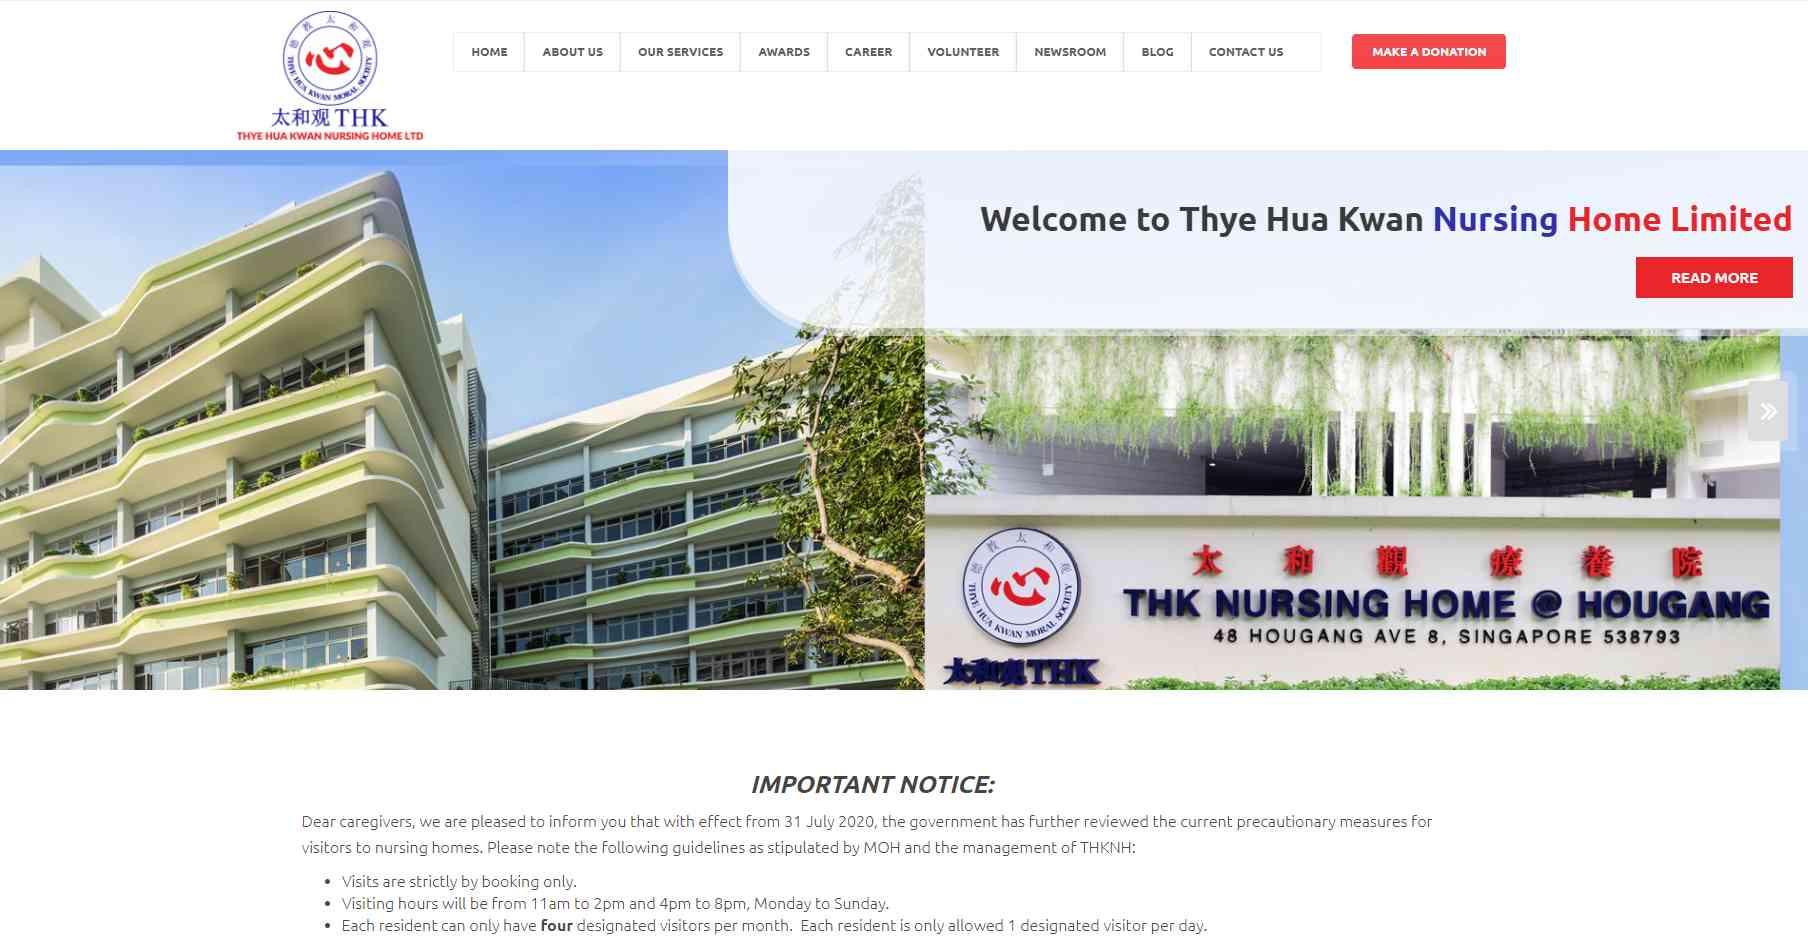 THKNH Top Nursing Homes in Singapore